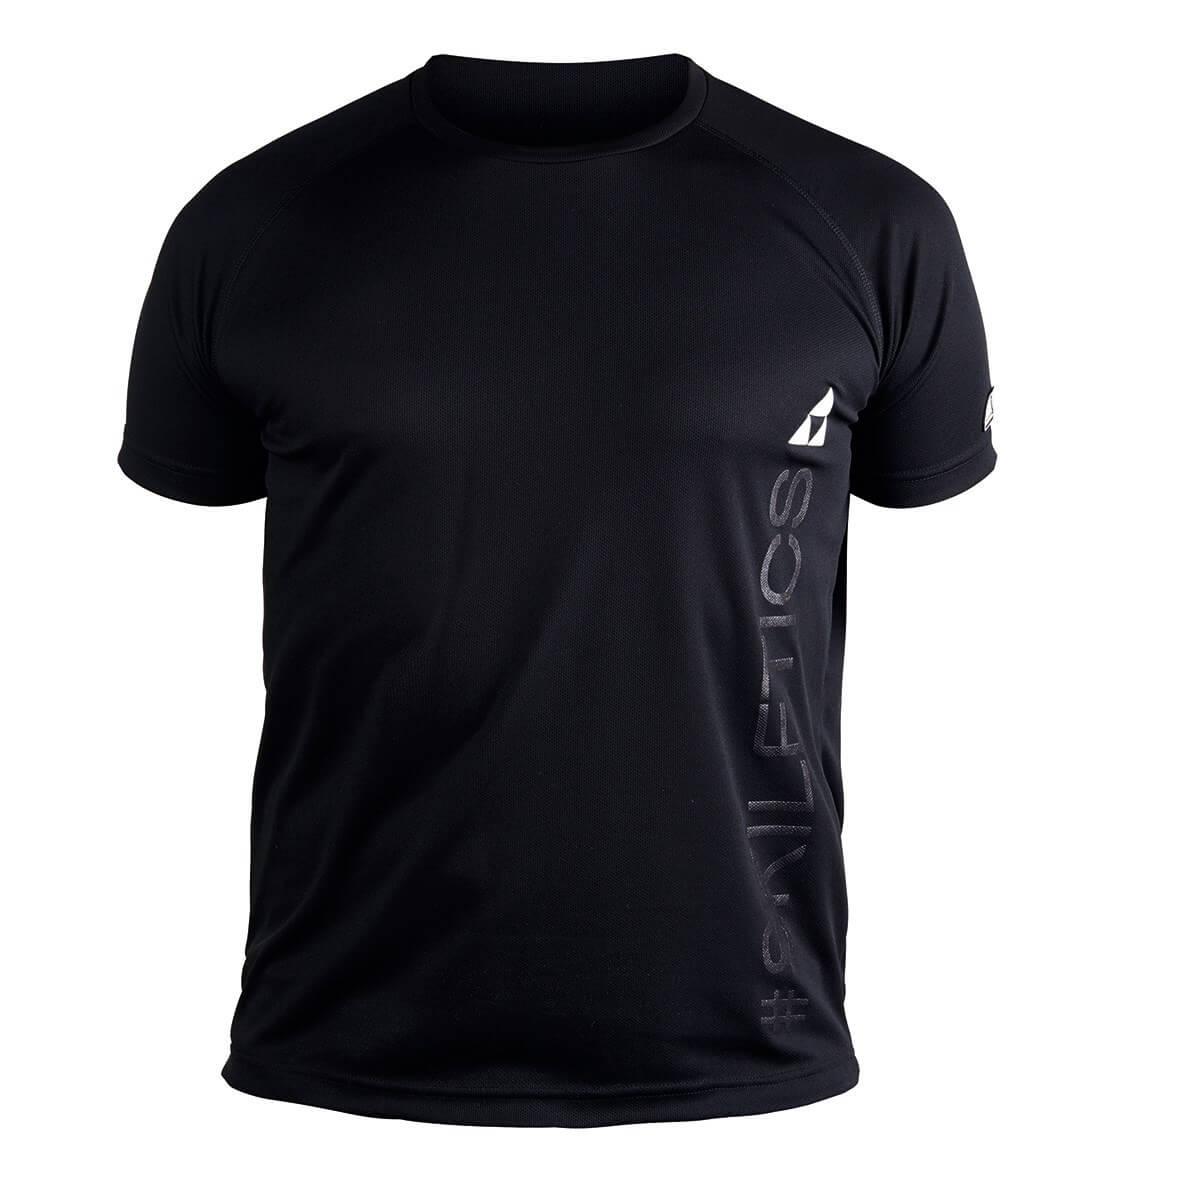 fischer t-shirt skiletics